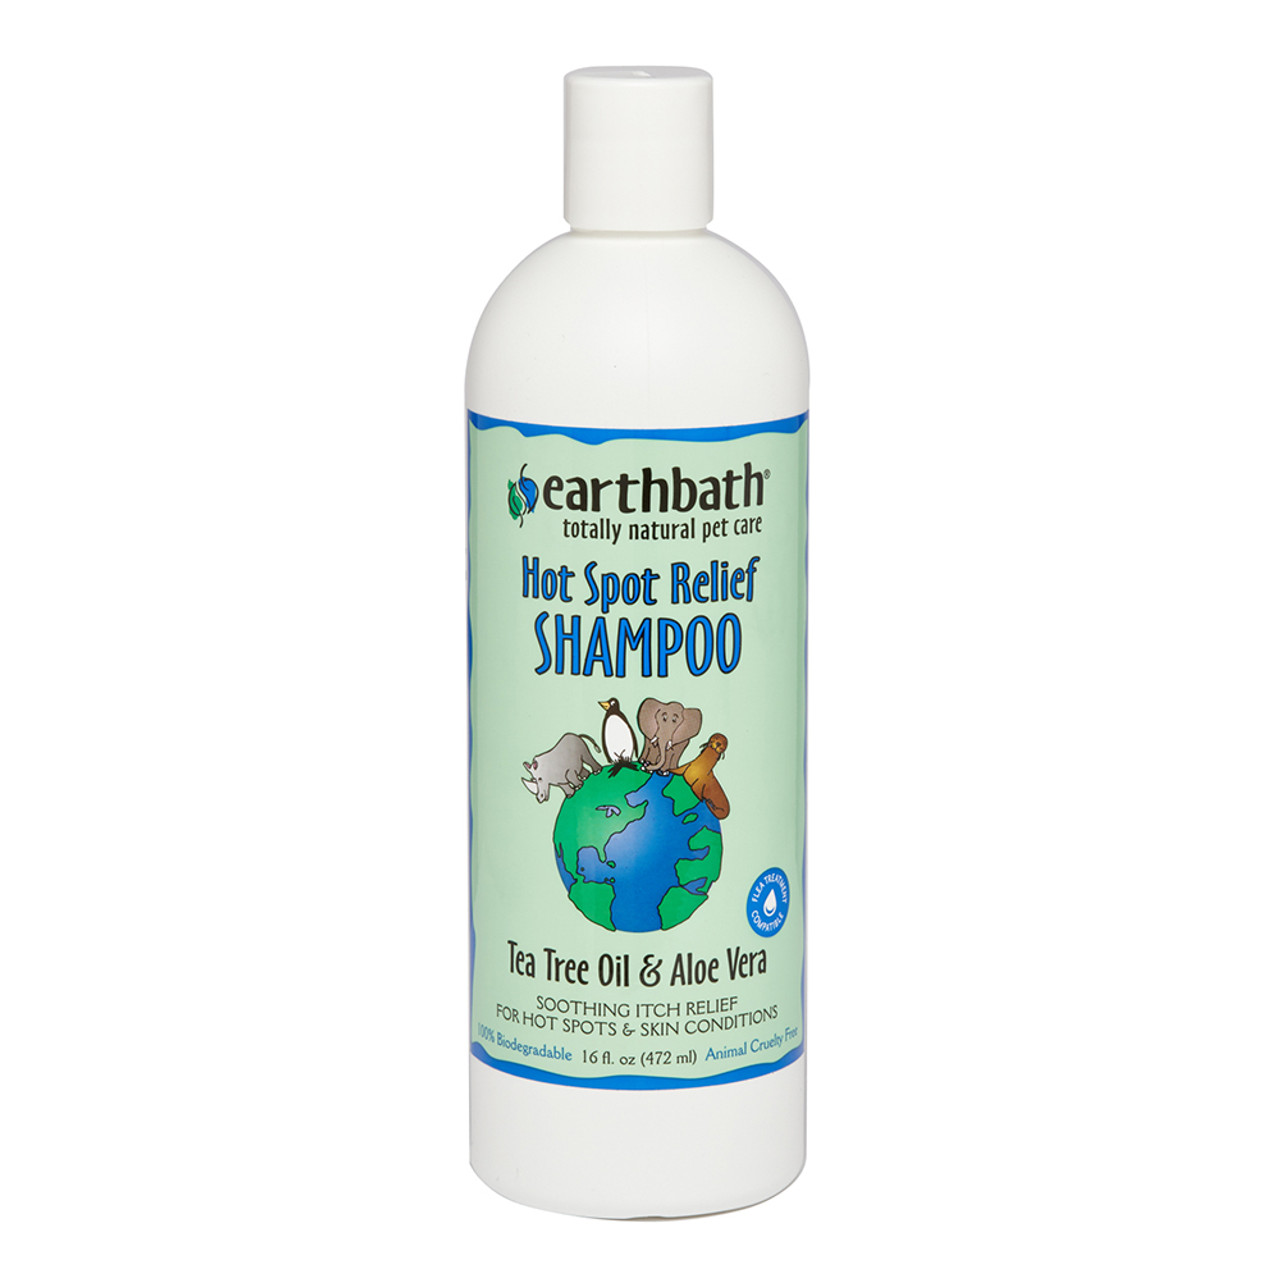 Earthbath Hot Spot Relief Shampoo for Pets